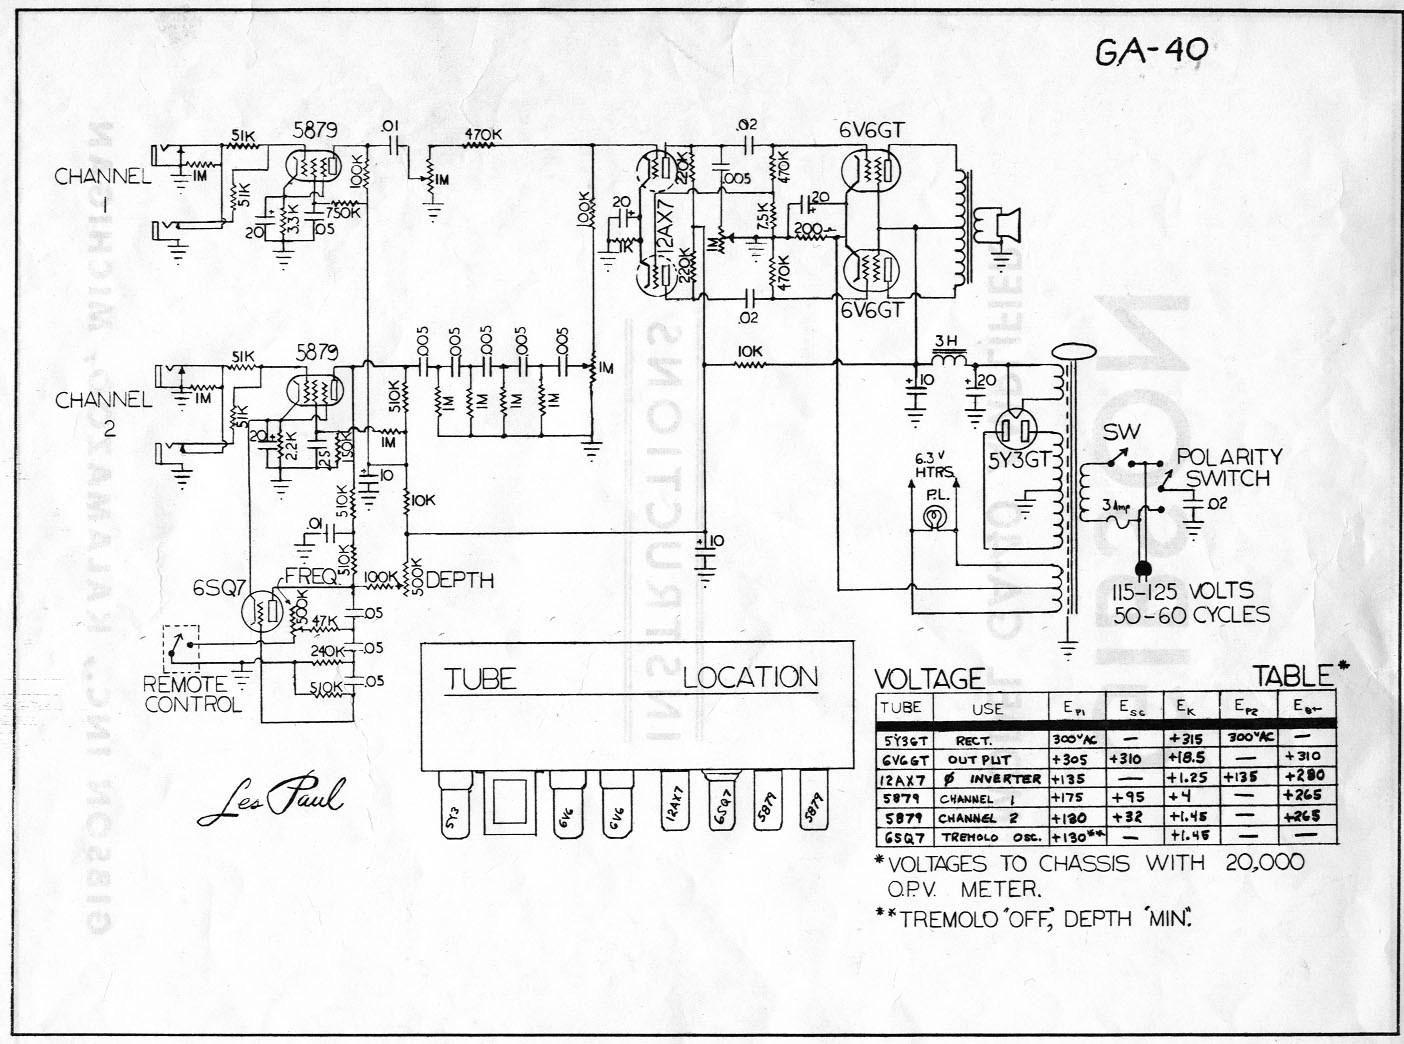 Rm 0251 Gibson Les Paul Jr Wiring Diagram Free Diagram